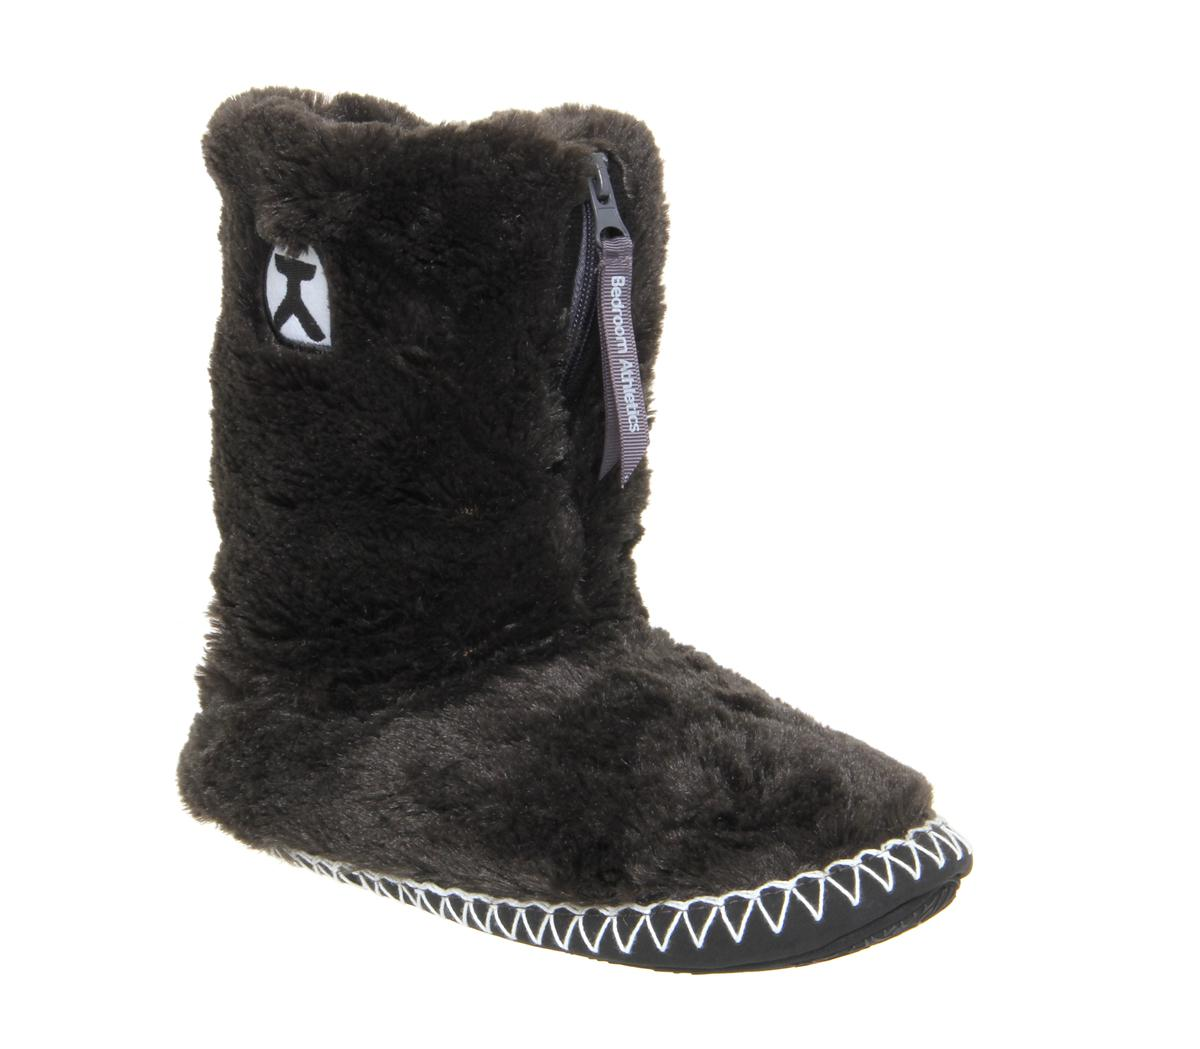 Bedroom Athletics Marilyn Iii Slipper Boots in Charcoal (Grey)